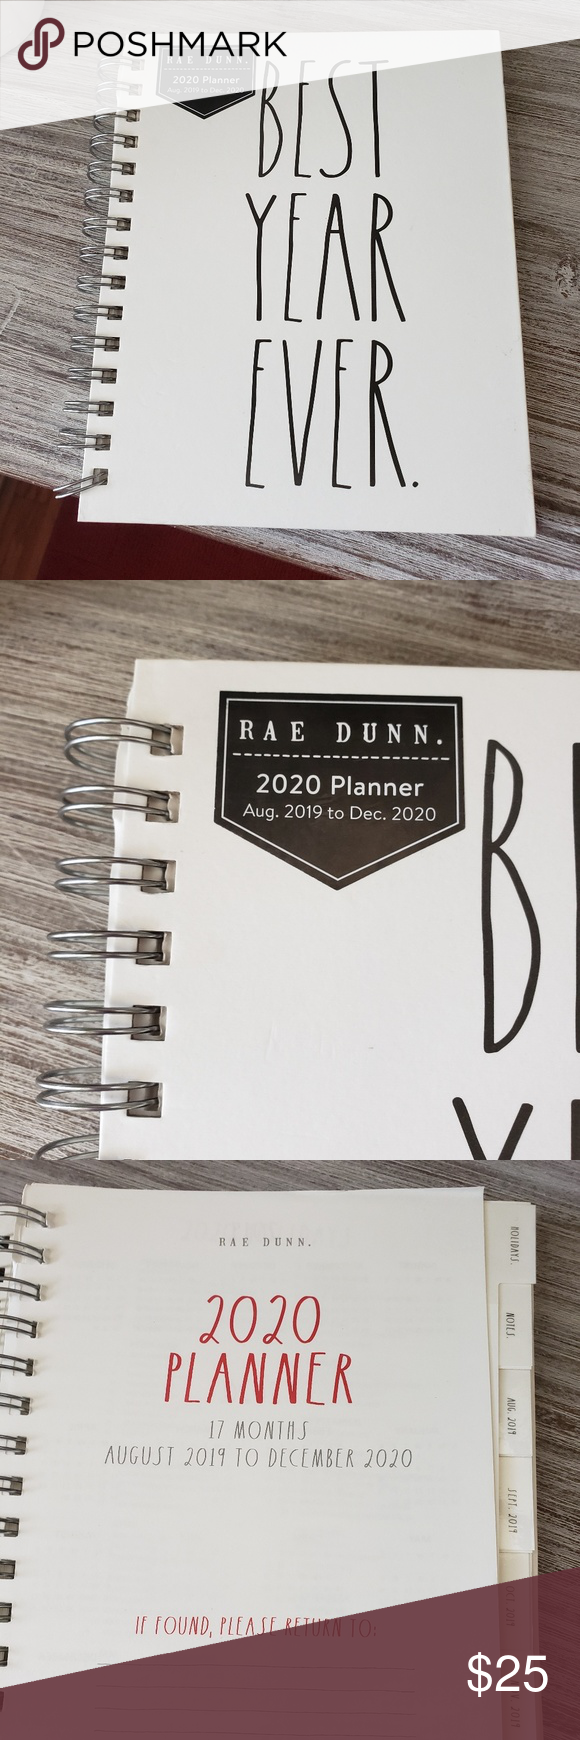 Rae Dunn BEST YEAR EVER Planner Agenda Calendar NWT (With